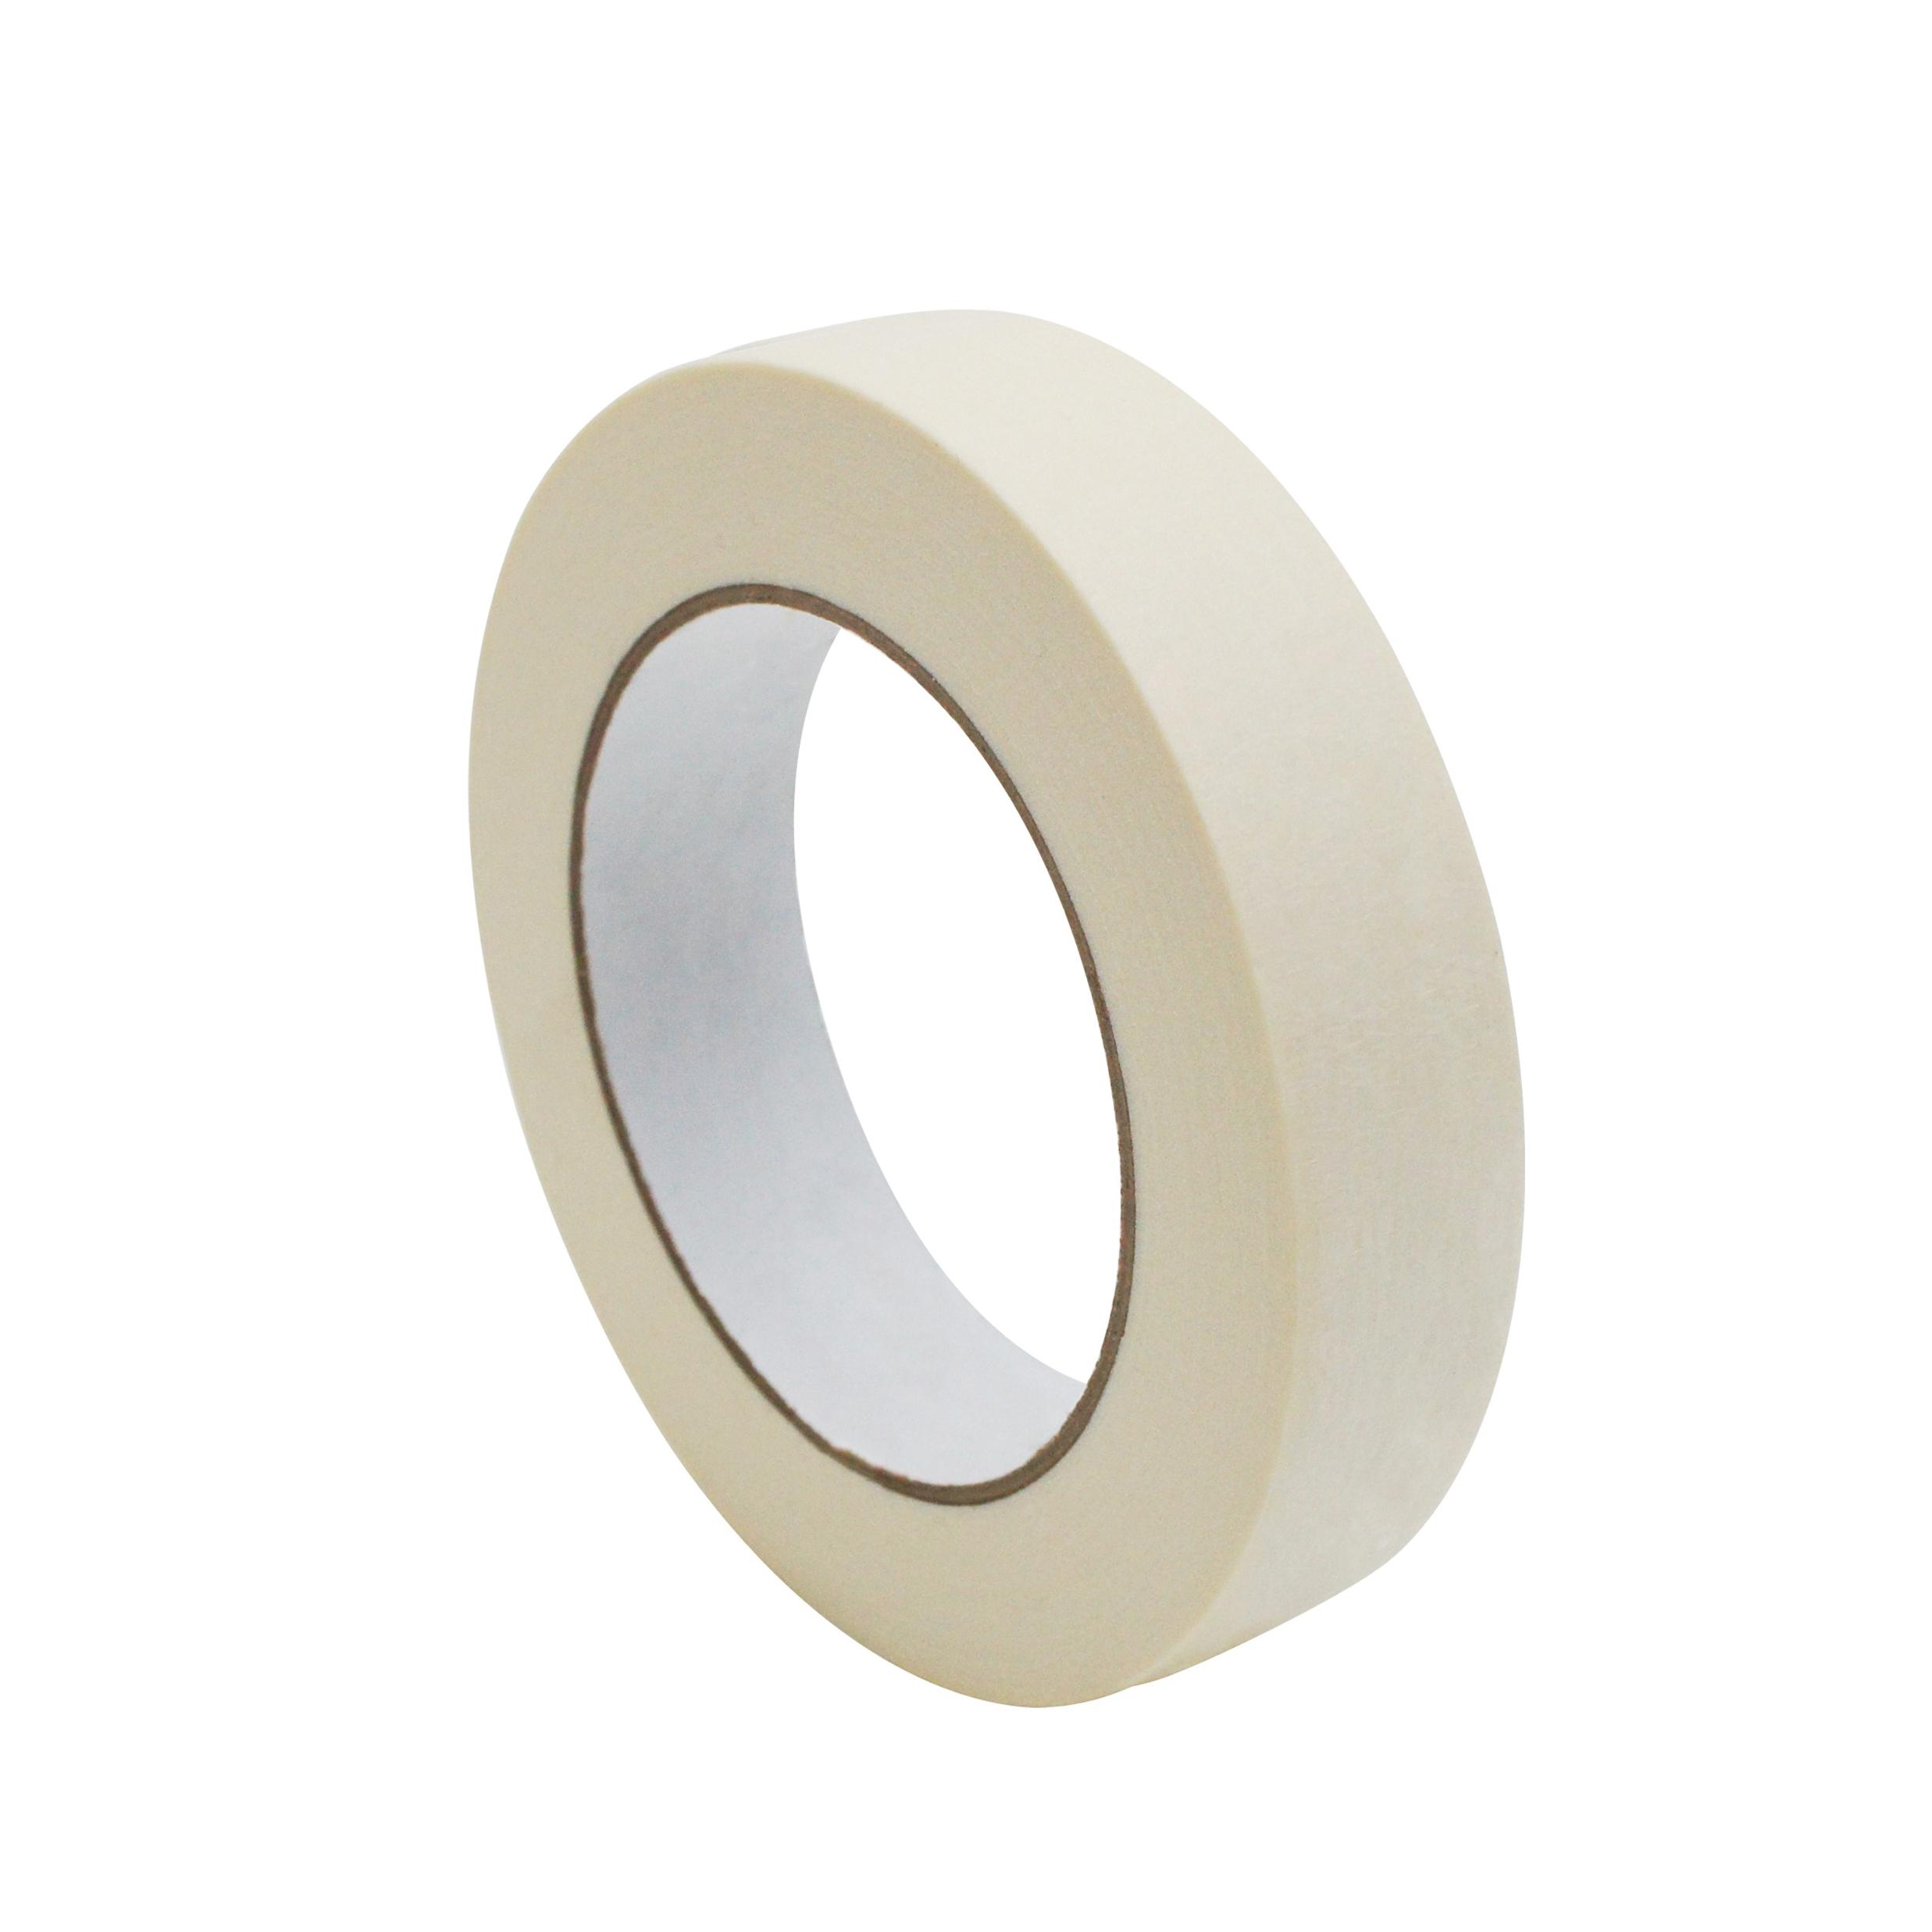 Regular Latex Free Tape  Image